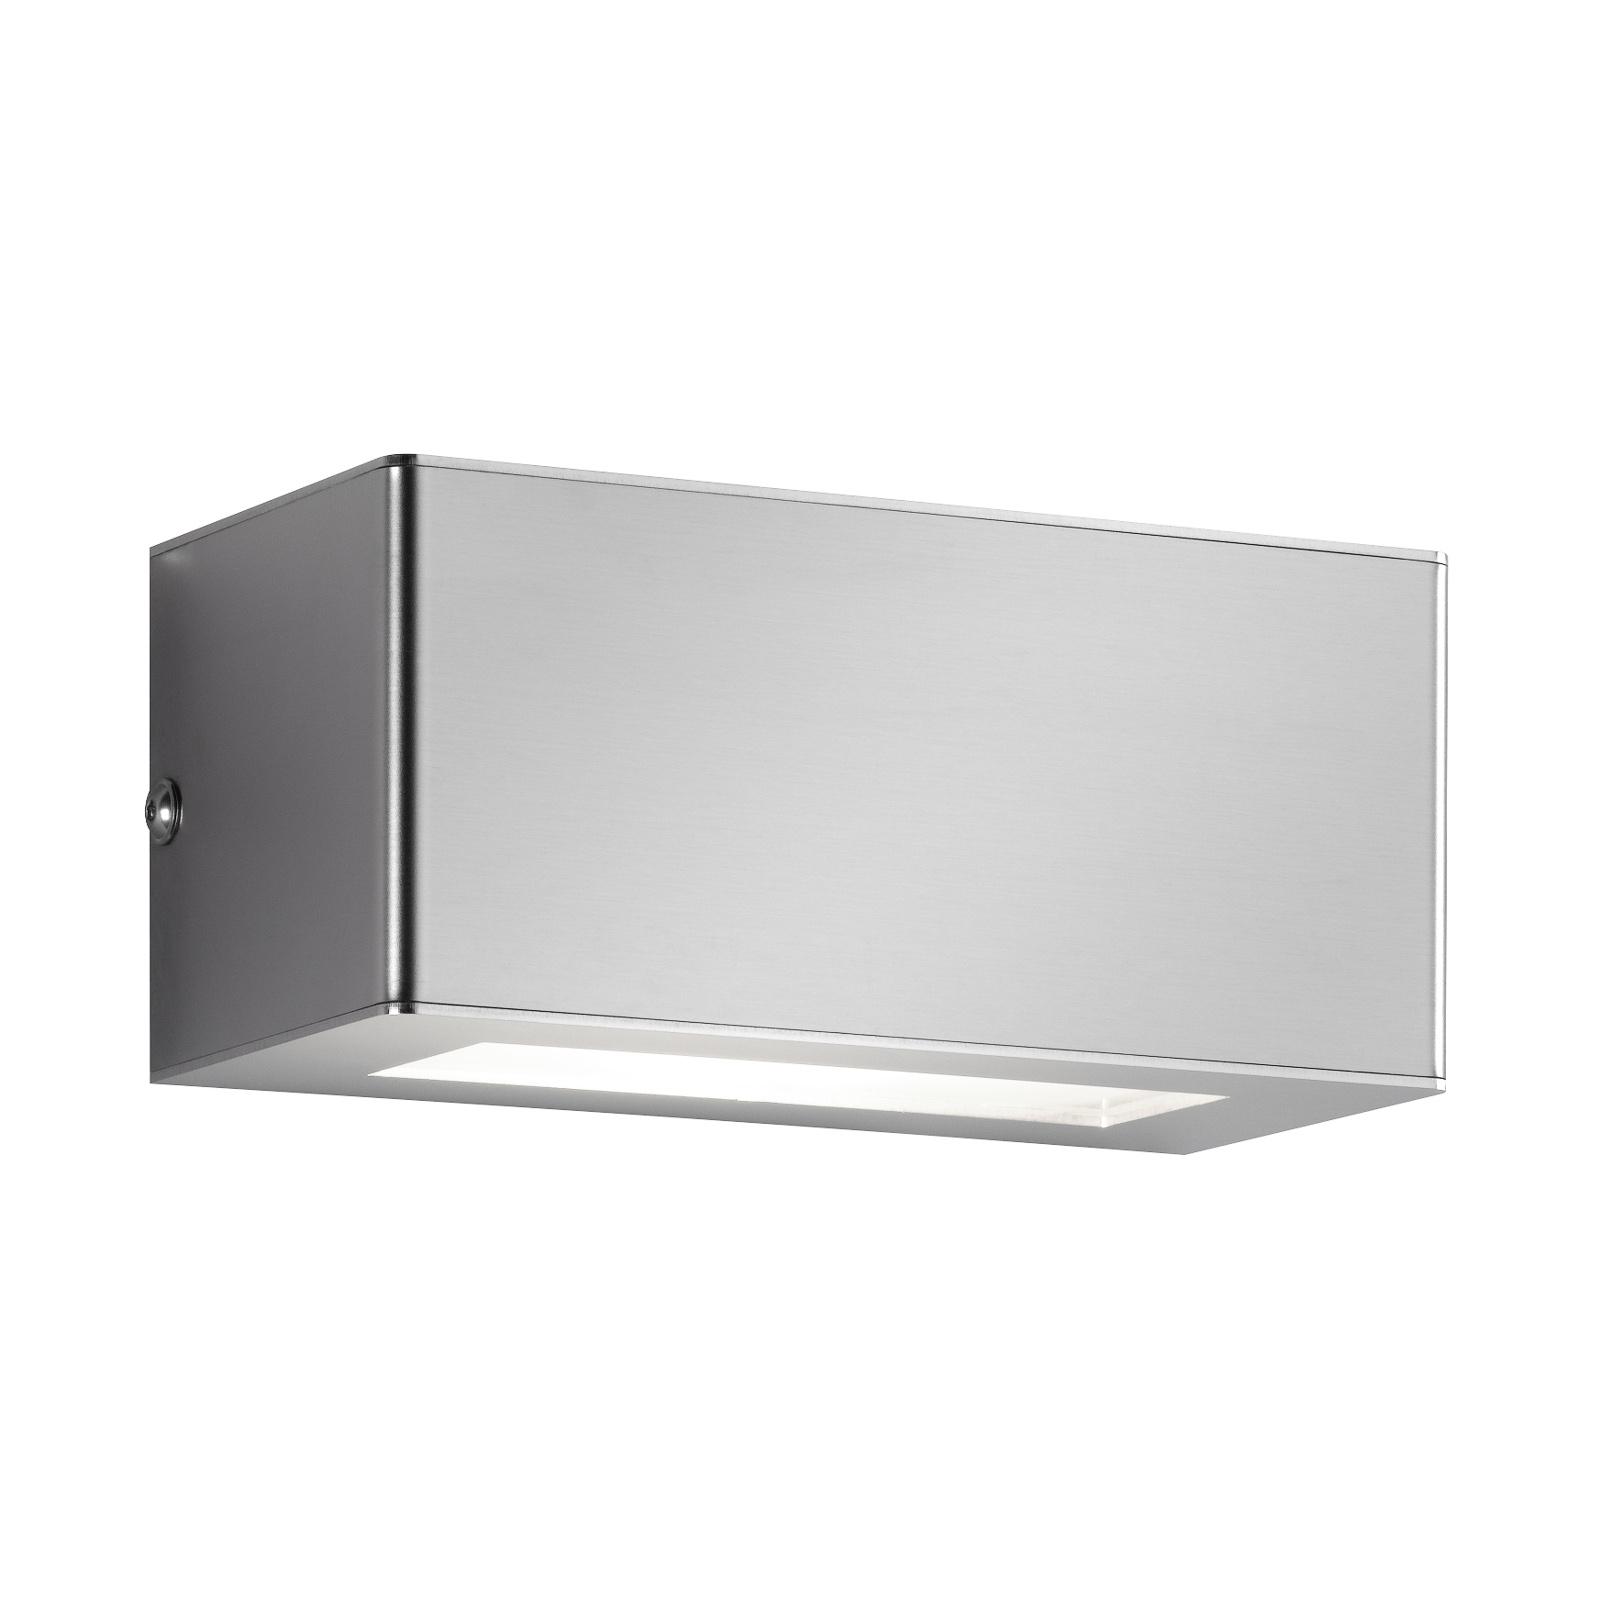 LED buitenwandlamp Aqua Stone, 2-lamps